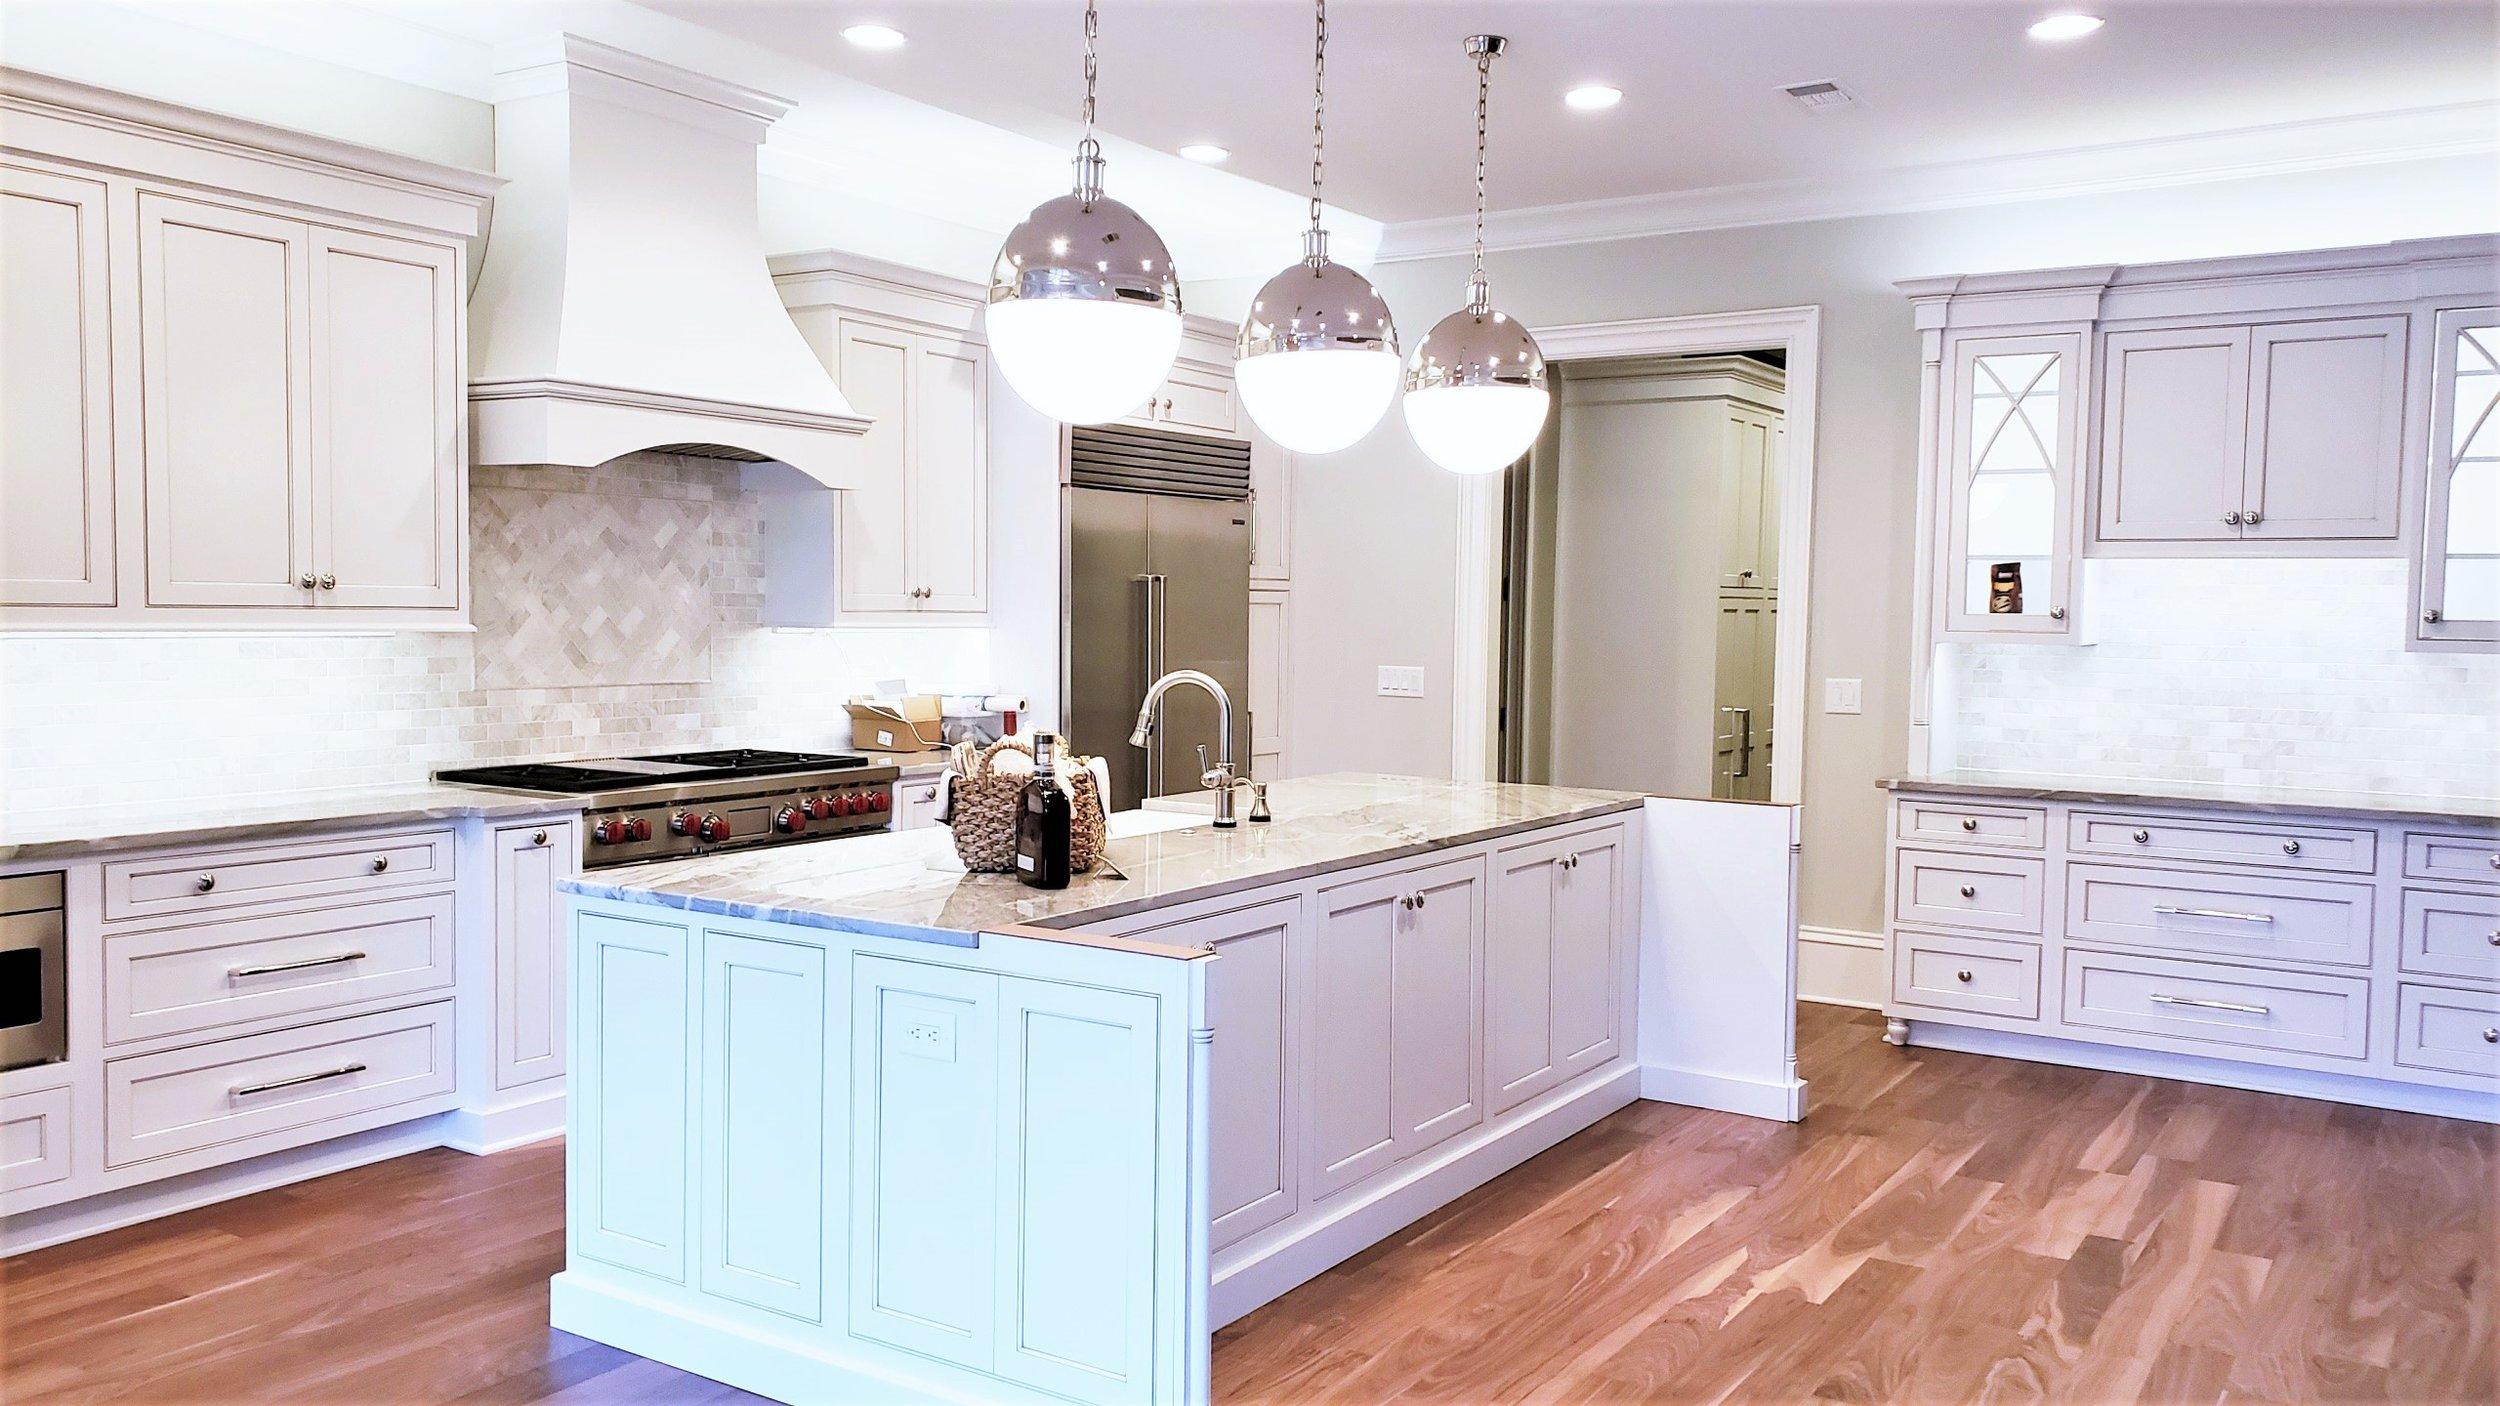 LUXE Homes Pro 005 kitchen.jpg